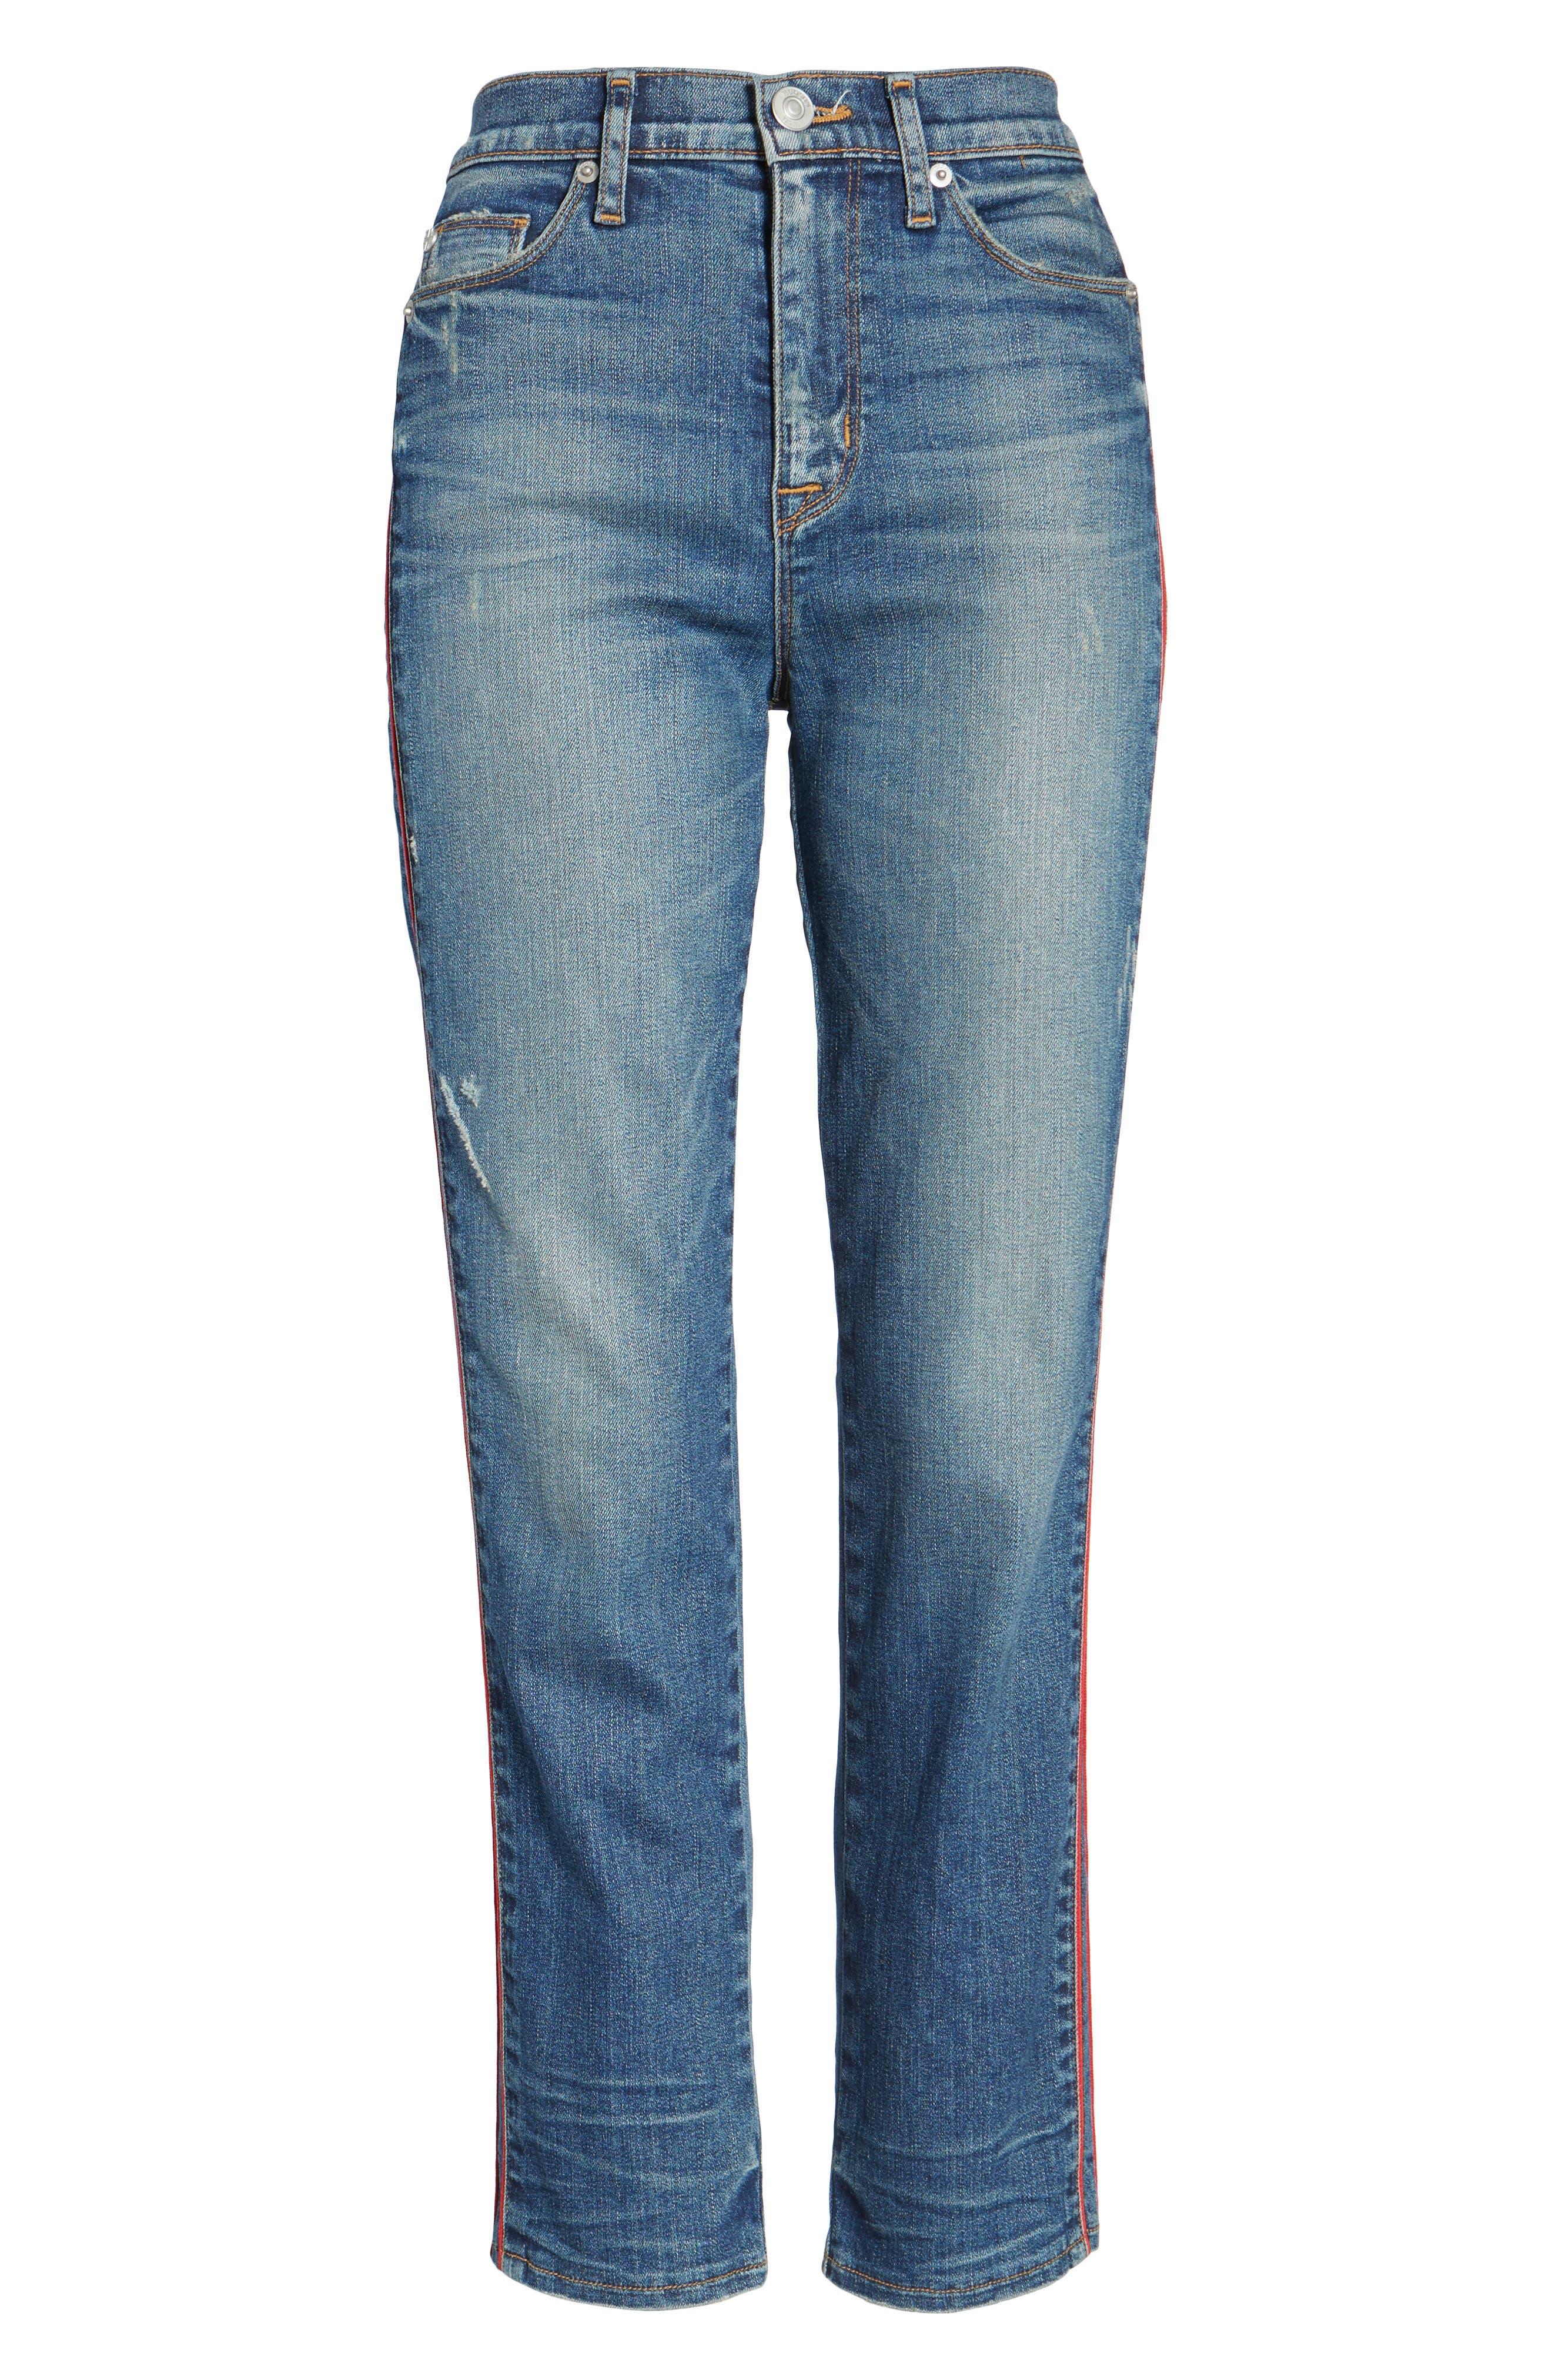 Zoeey High Waist Crop Jeans,                             Alternate thumbnail 6, color,                             460